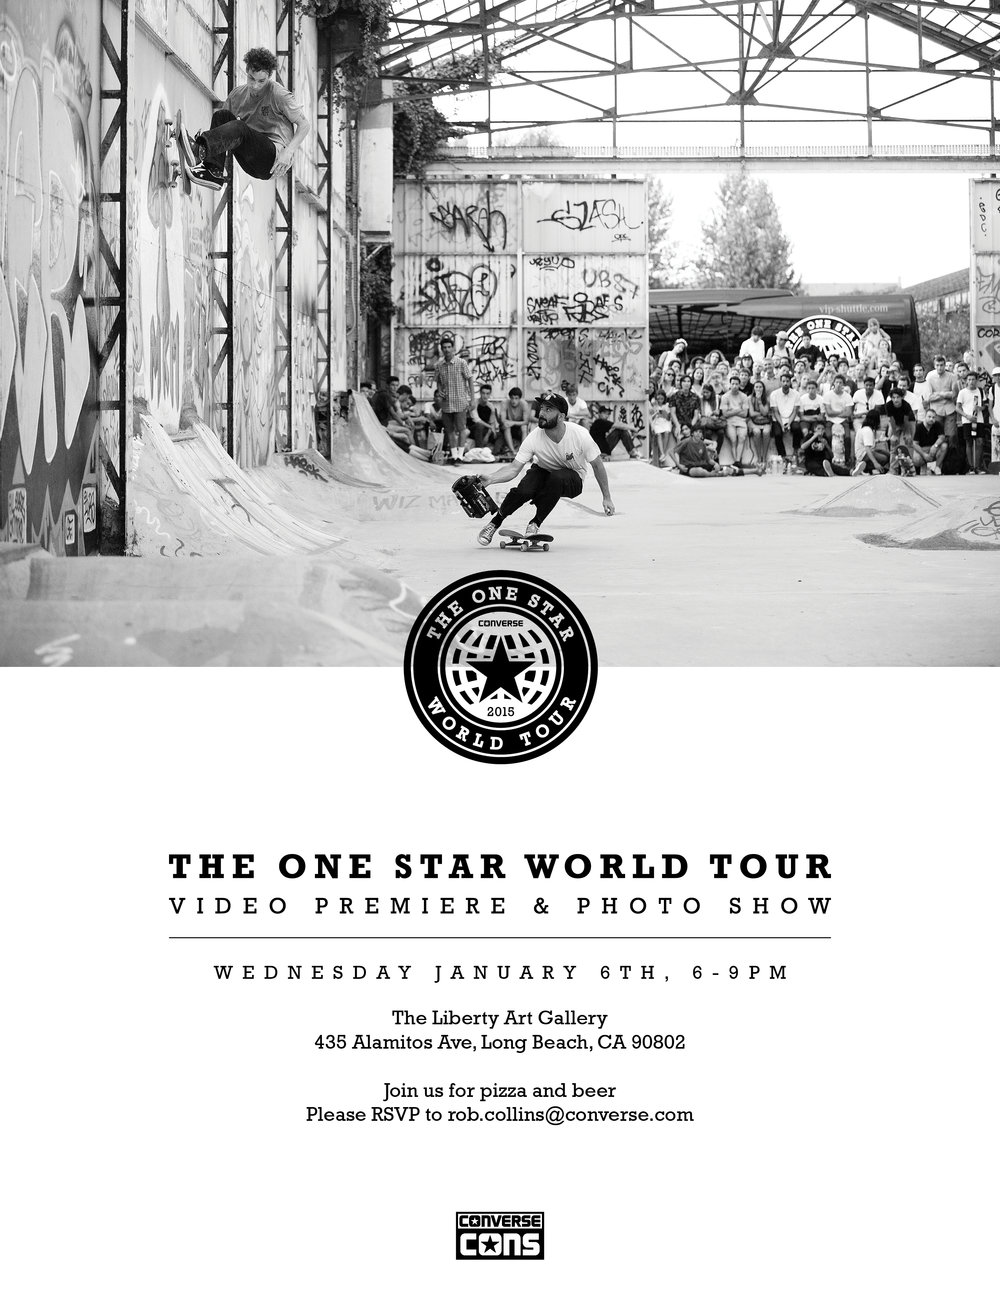 One Star World Tour Show Invitation